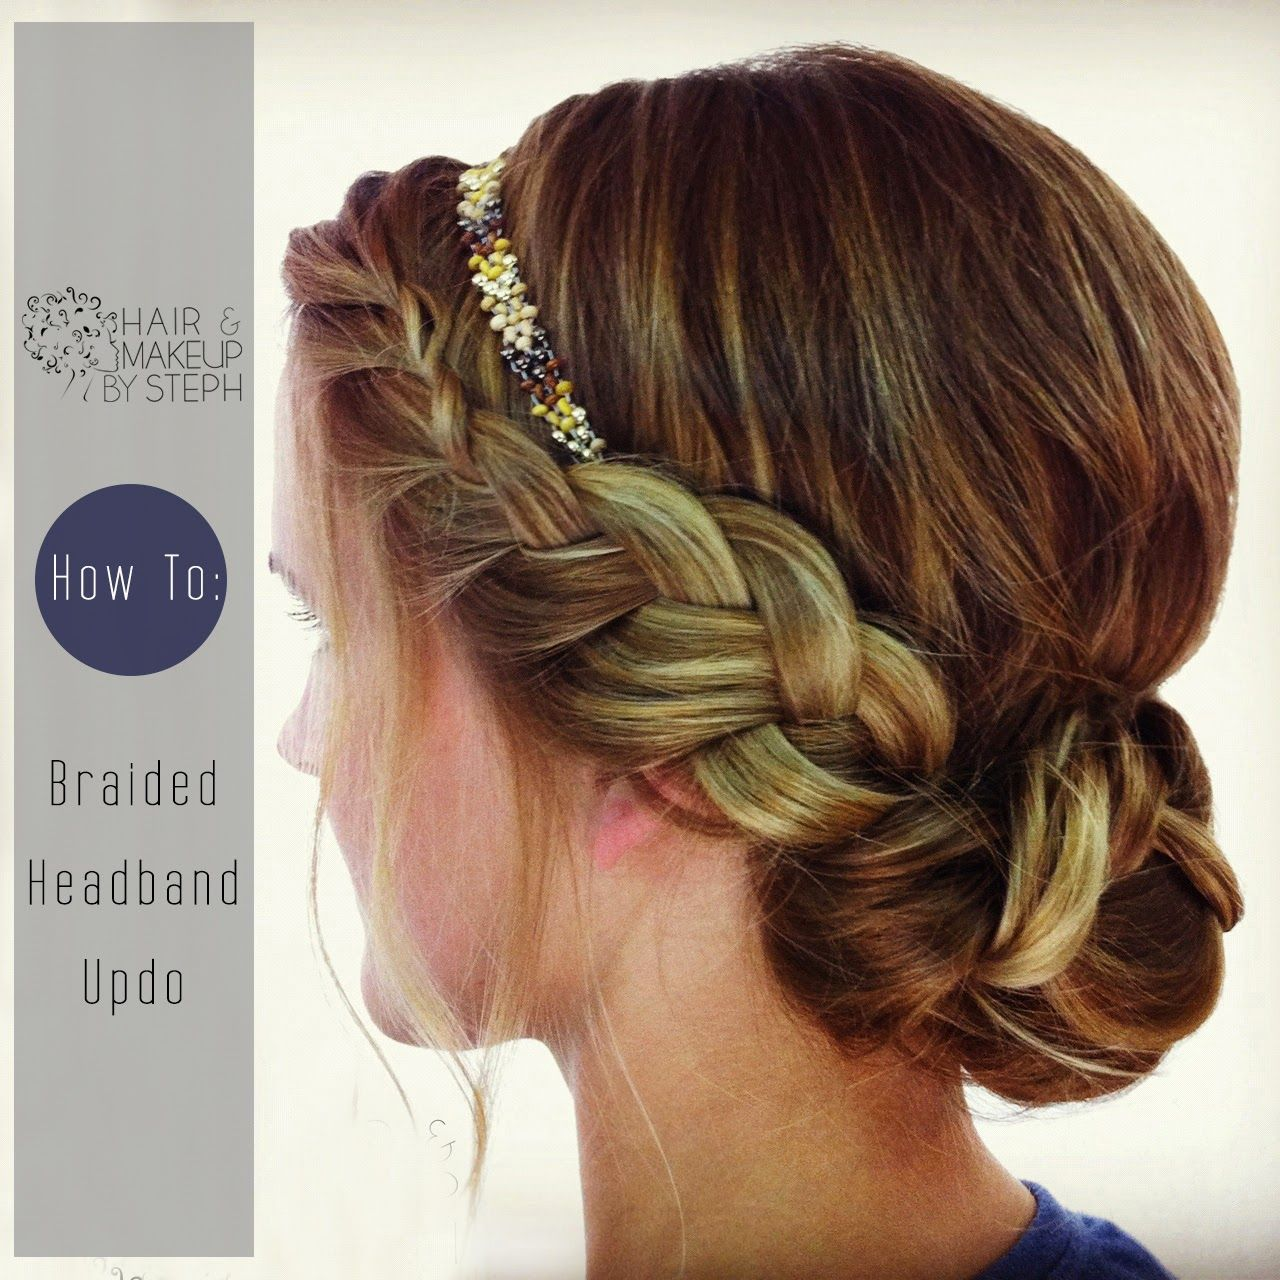 Hair and makeup by steph hair pinterest headband updo updo